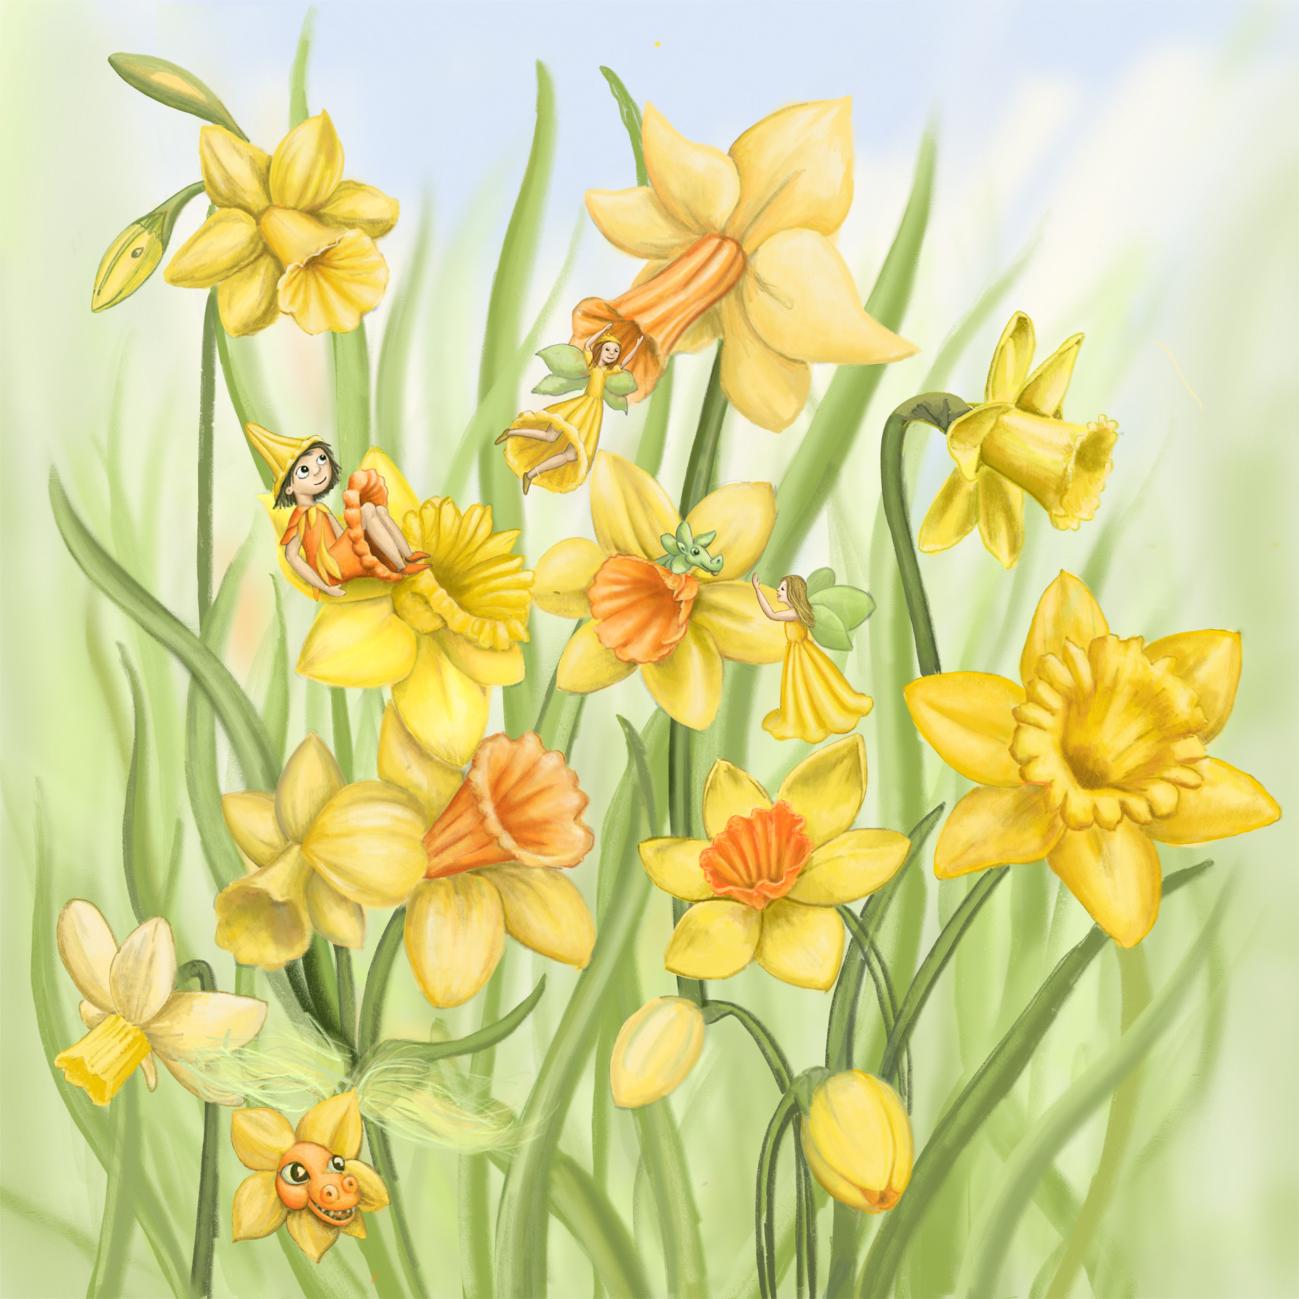 Dancing Daffodils -